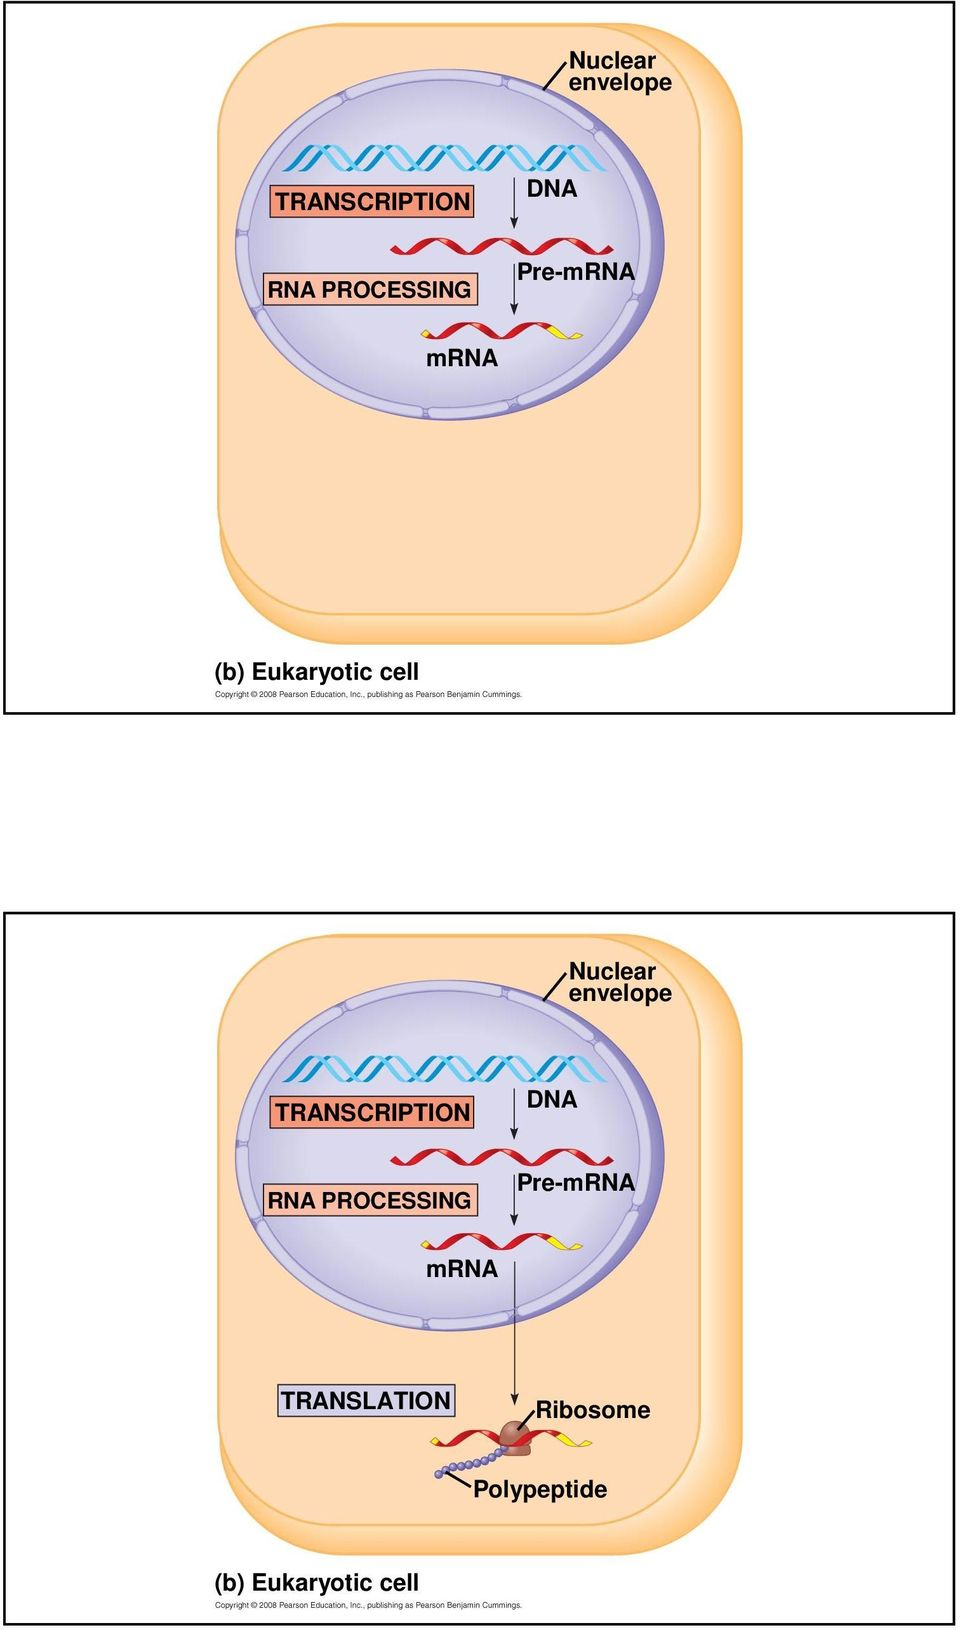 medium resolution of translation ribosome polypeptide b eukaryotic